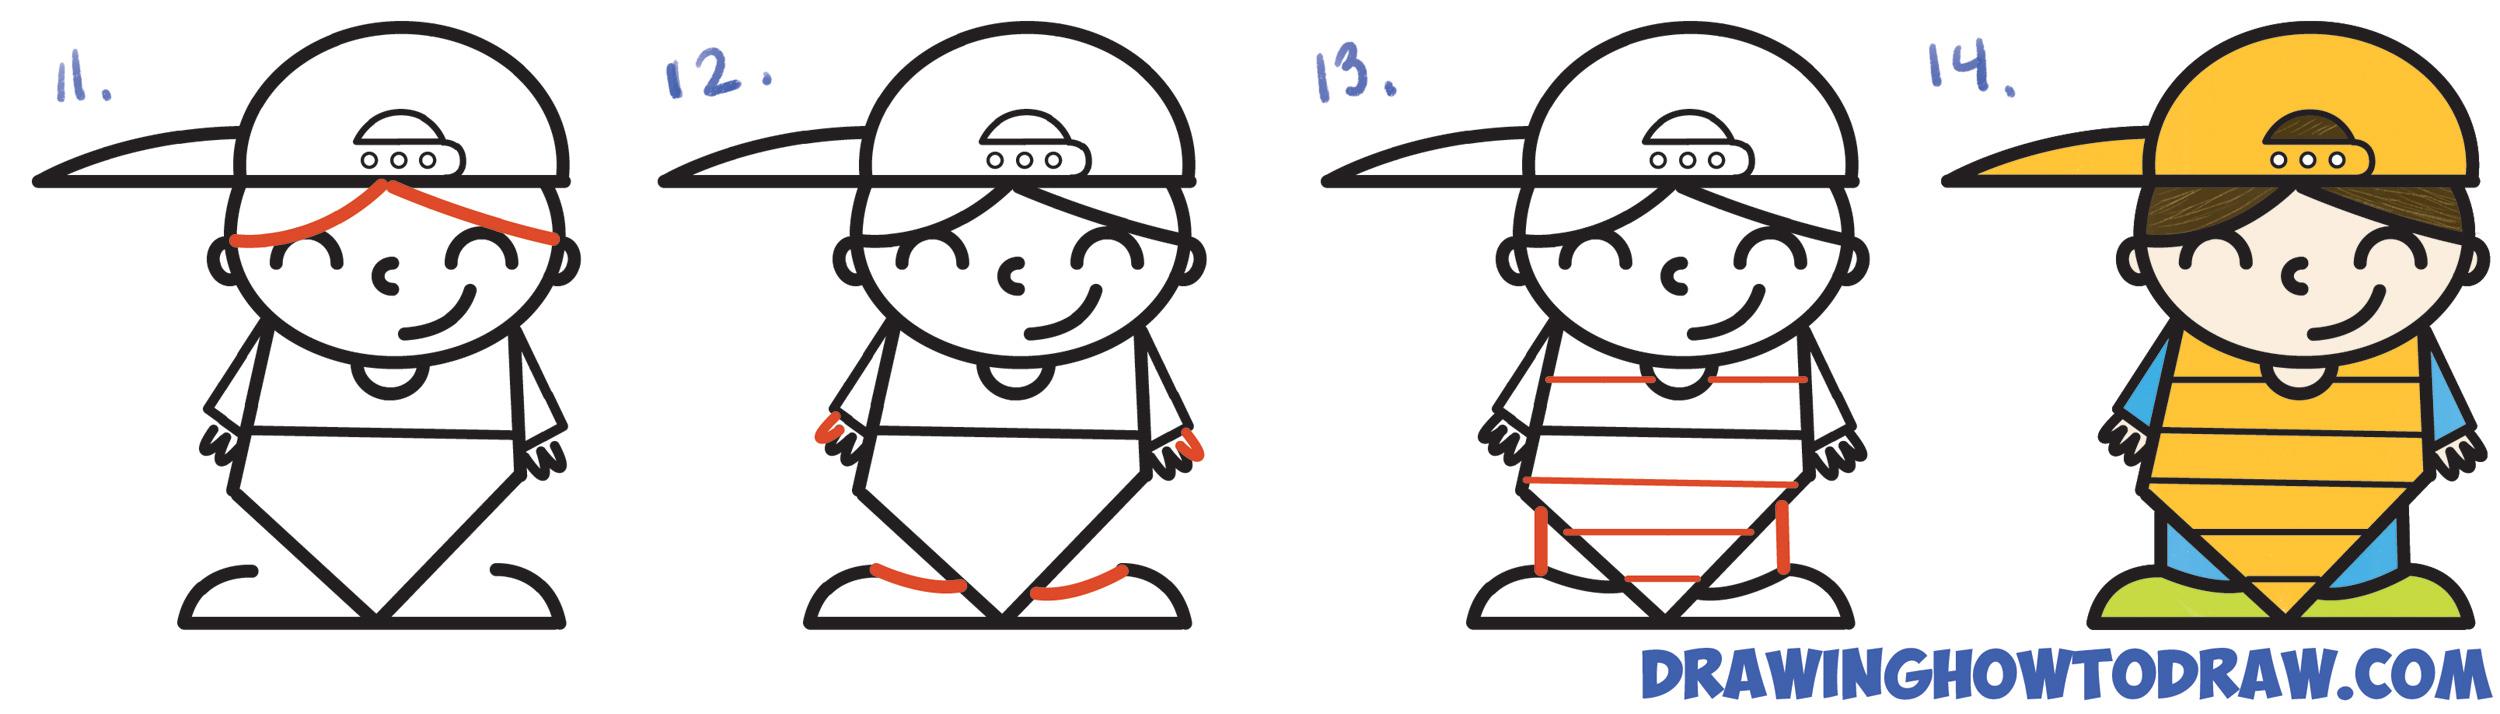 2500x714 Baseball Cartoon Drawings Learn How To Draw A Cute Cartoon Kid